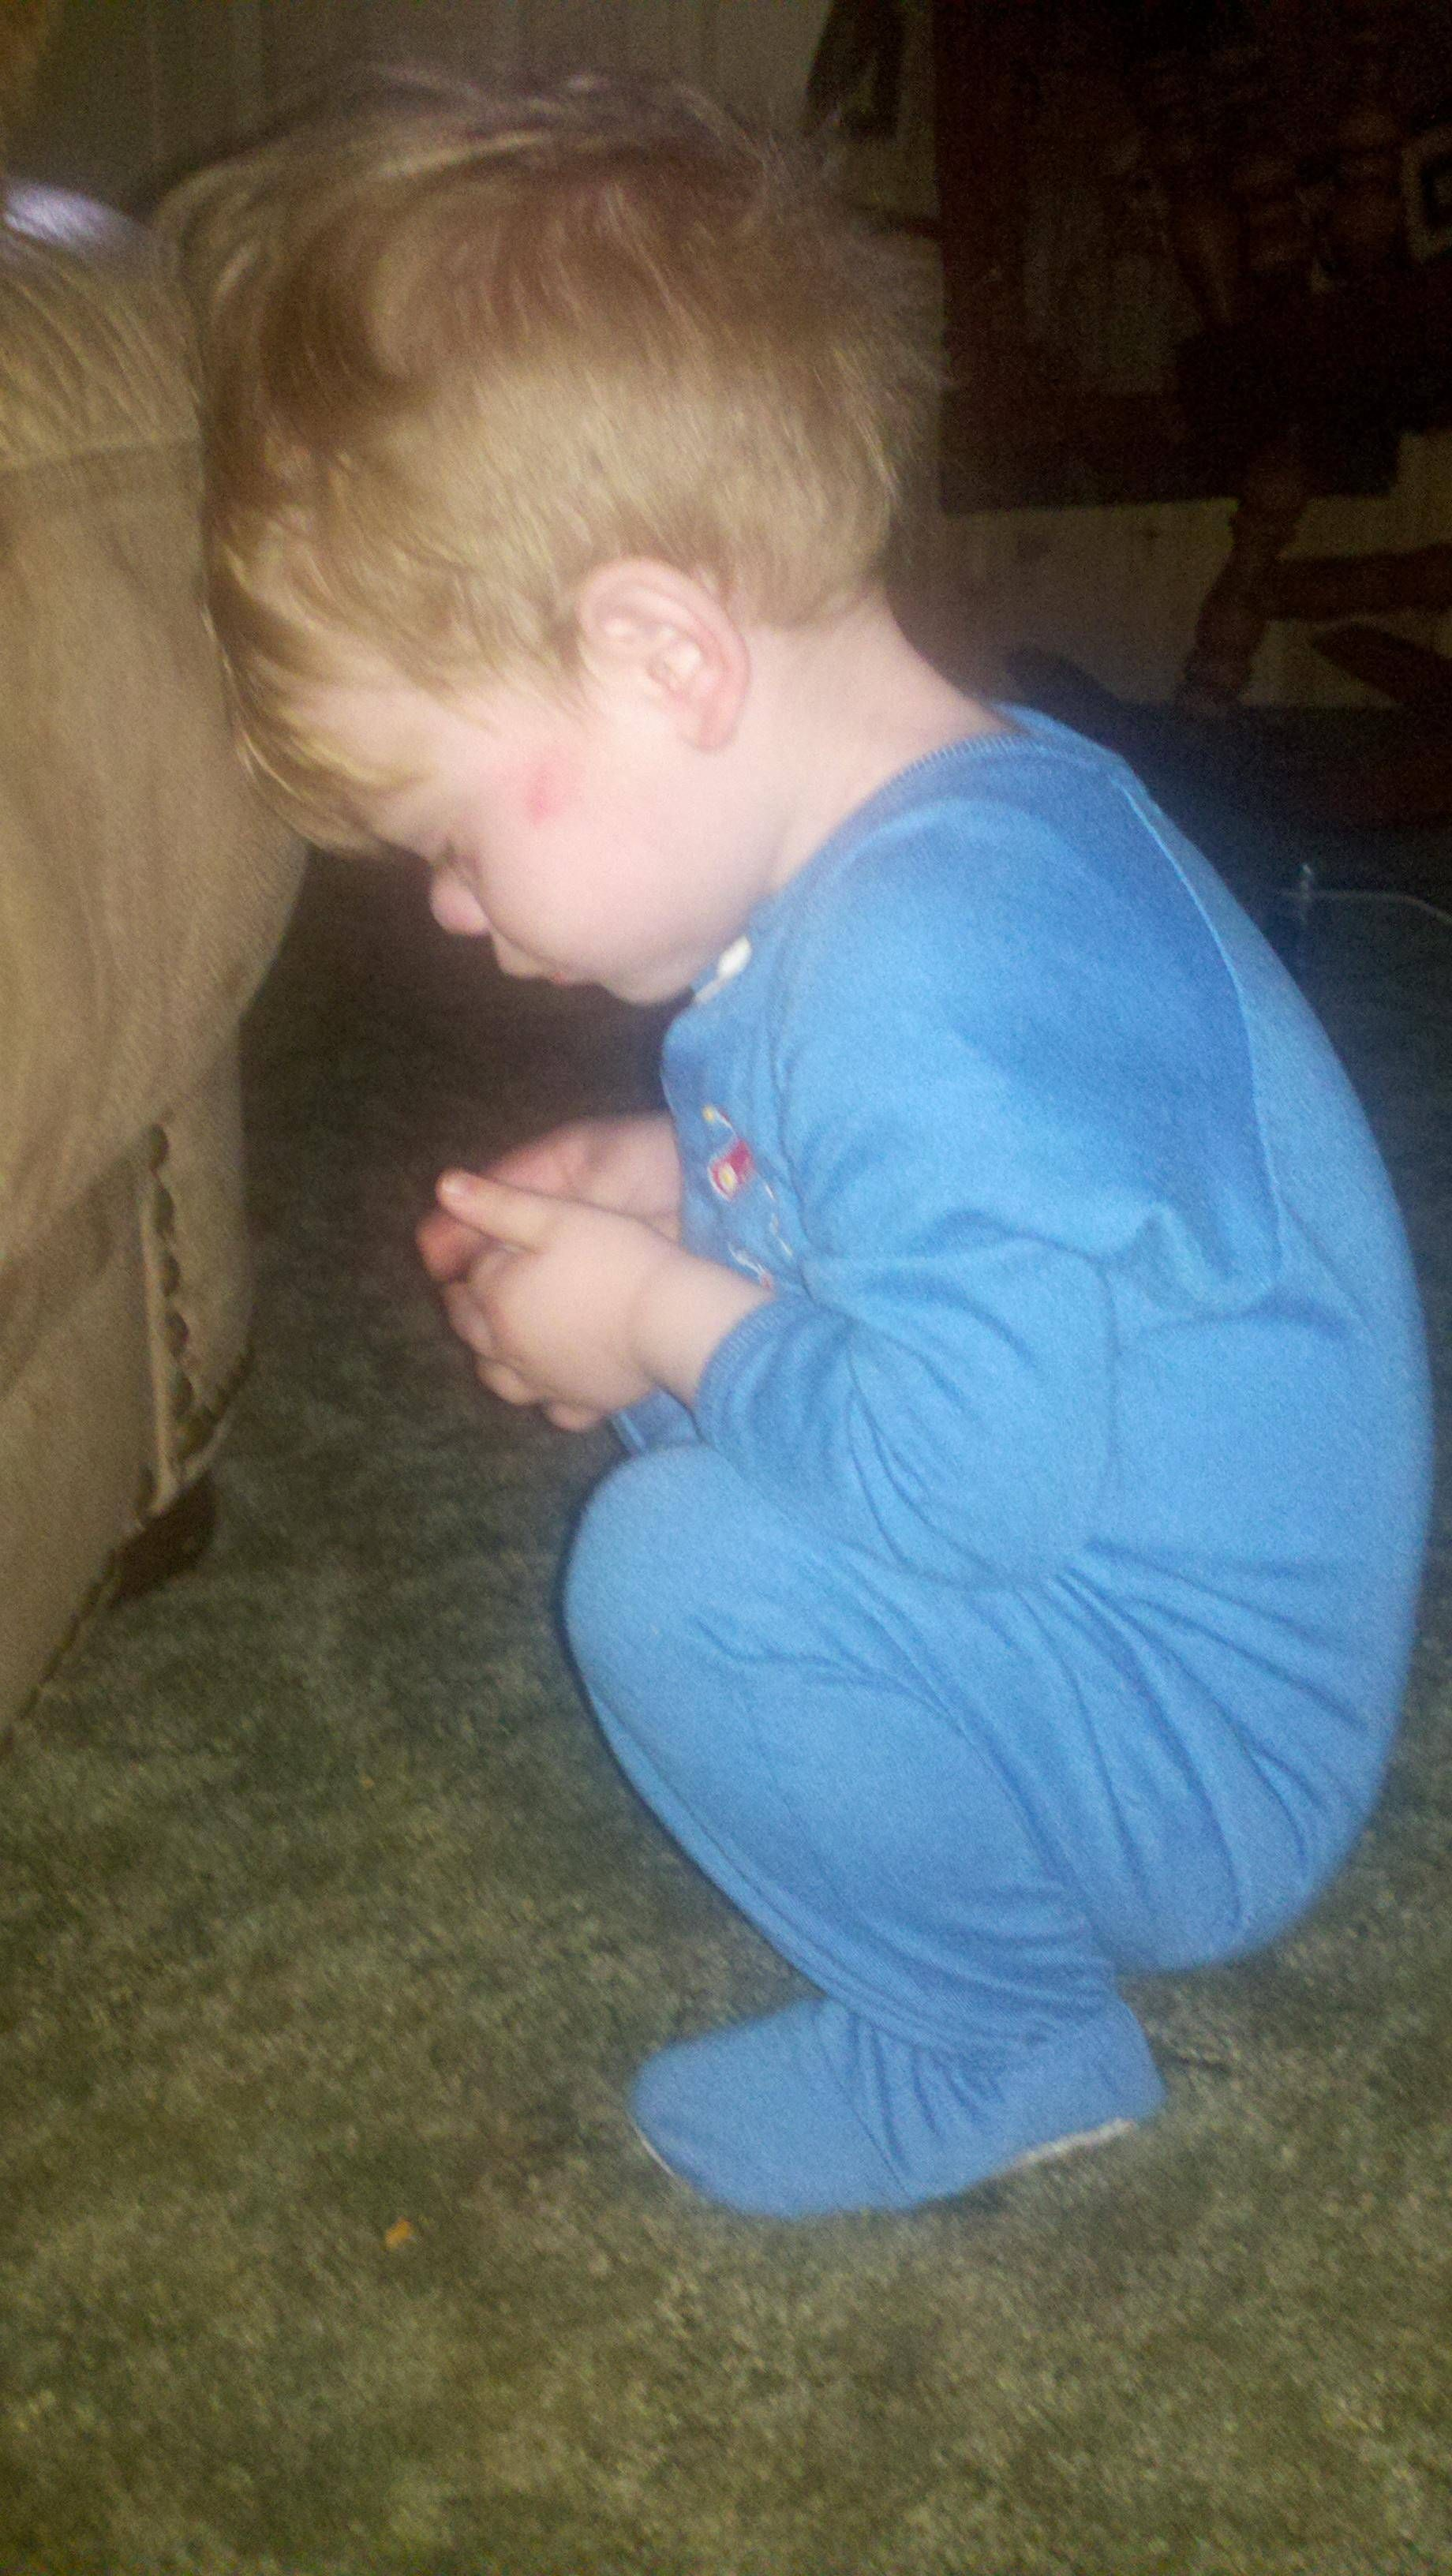 Praying babies are sooo cute!